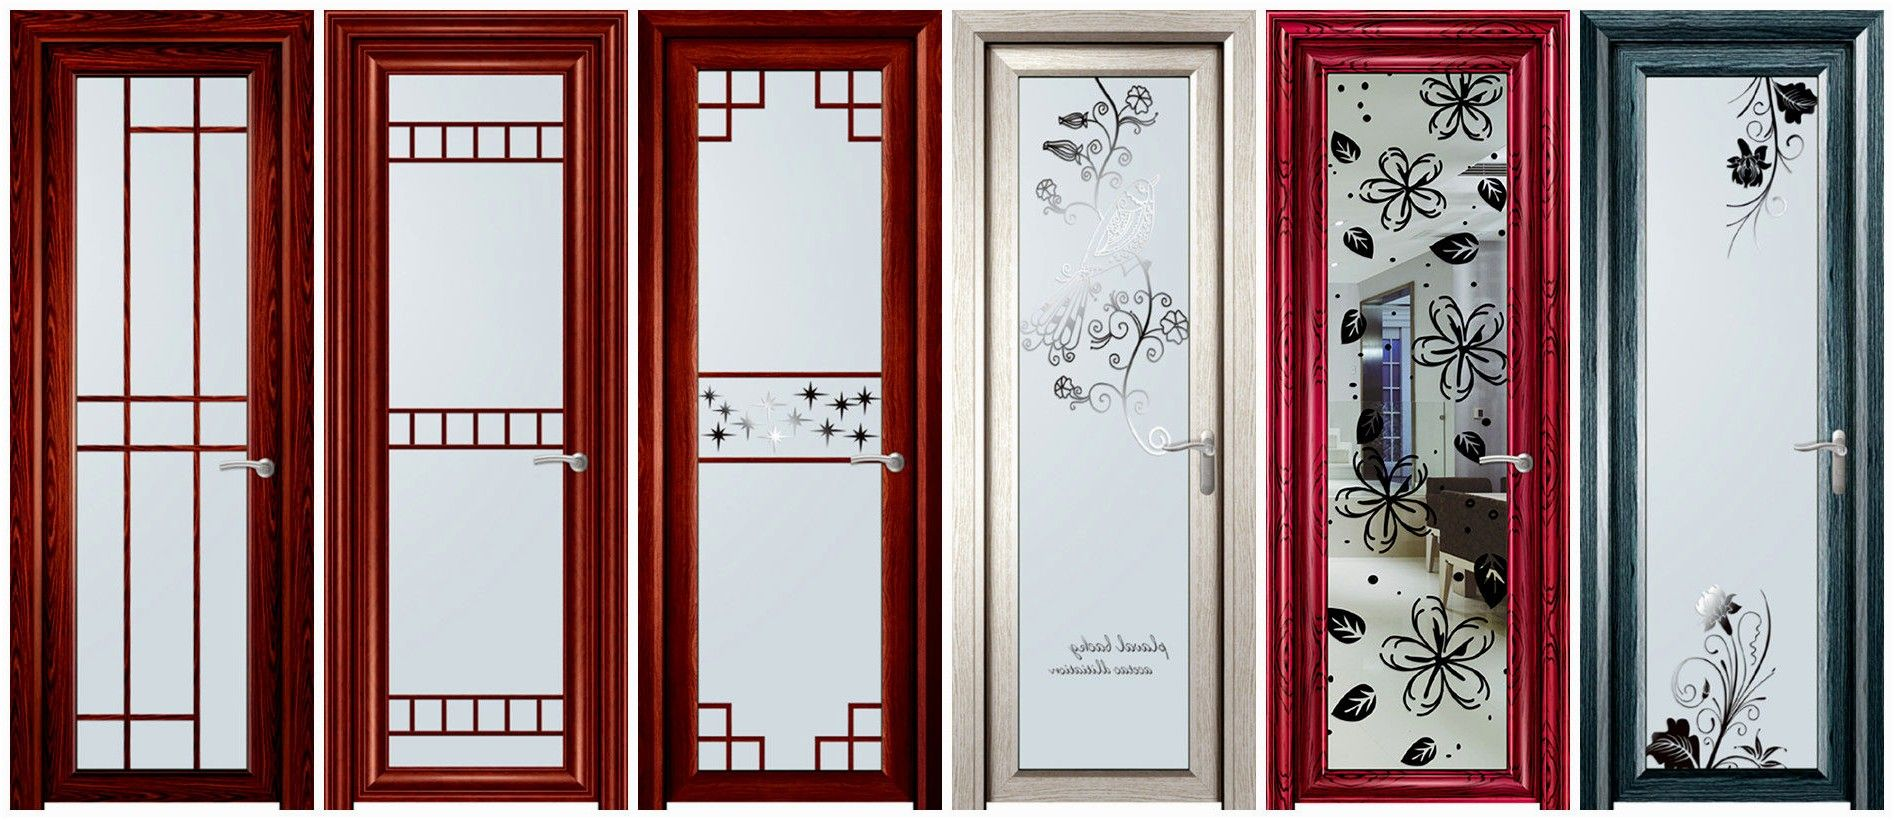 Bathroom Doors Design Interesting China Indian Design Aluminum Stunning Bathroom Doors Design 2018